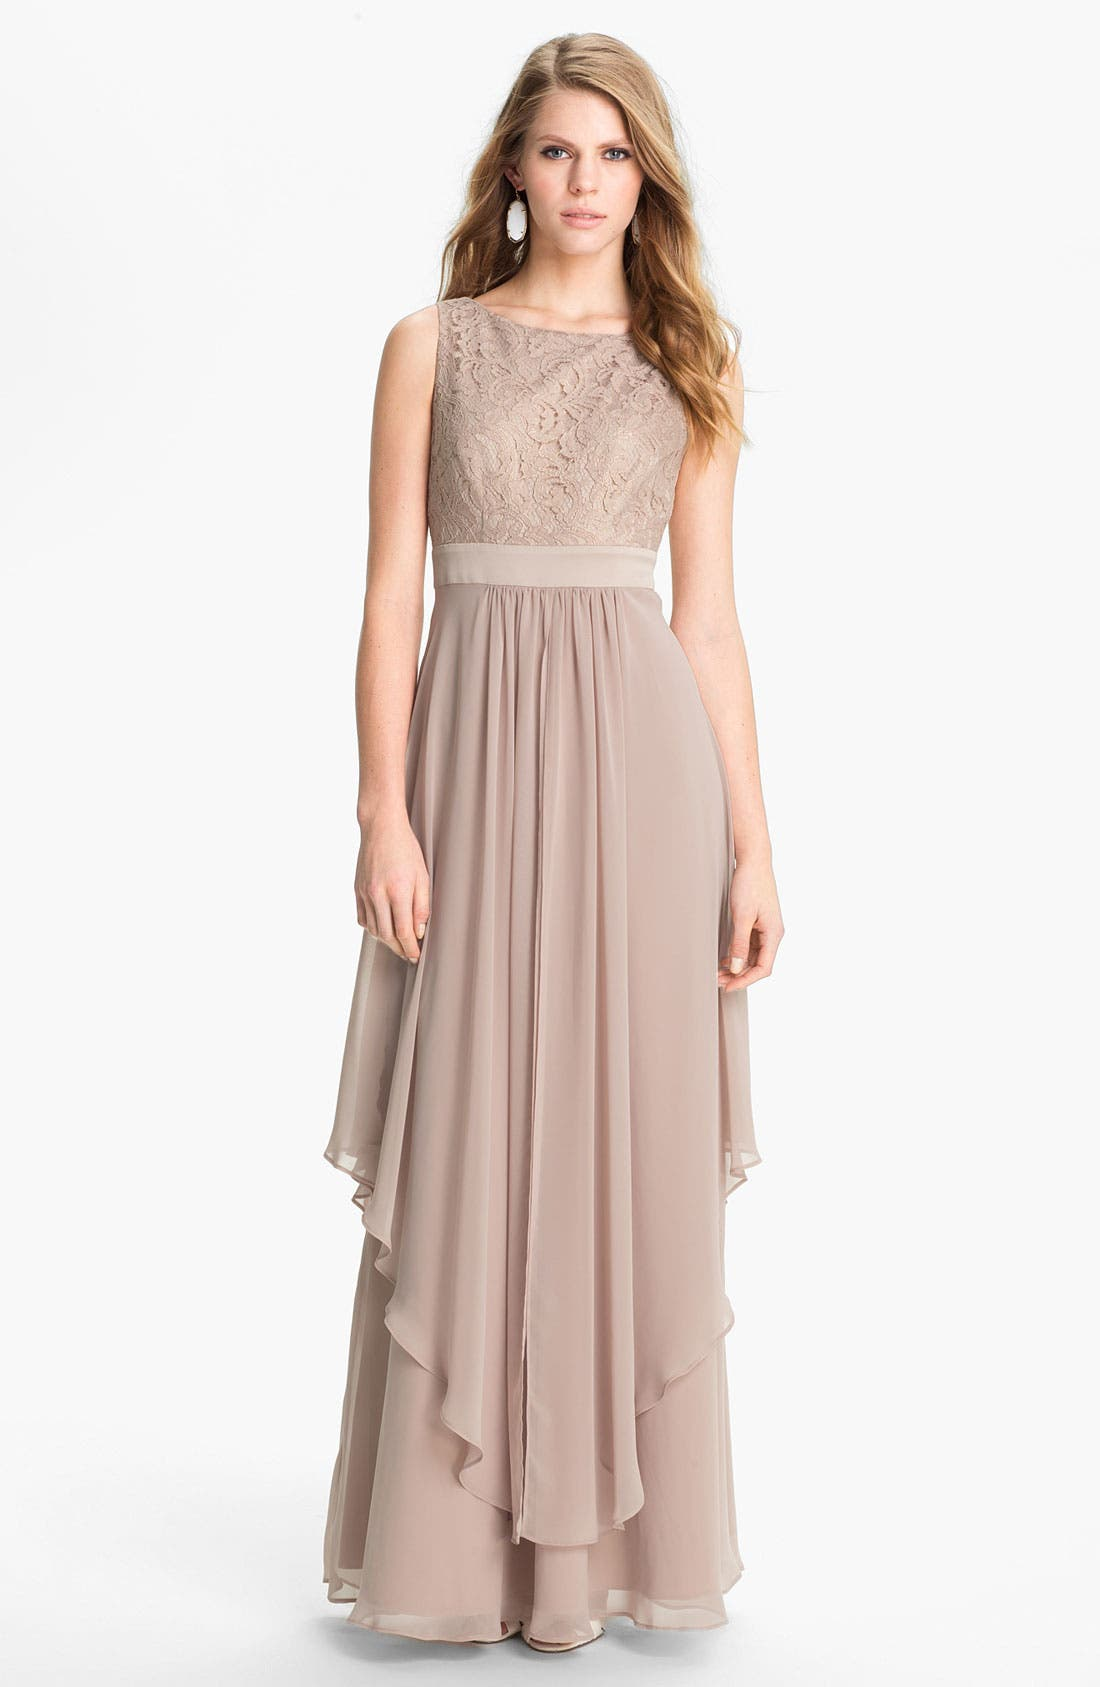 Alternate Image 1 Selected - Eliza J Sleeveless Lace & Chiffon Gown